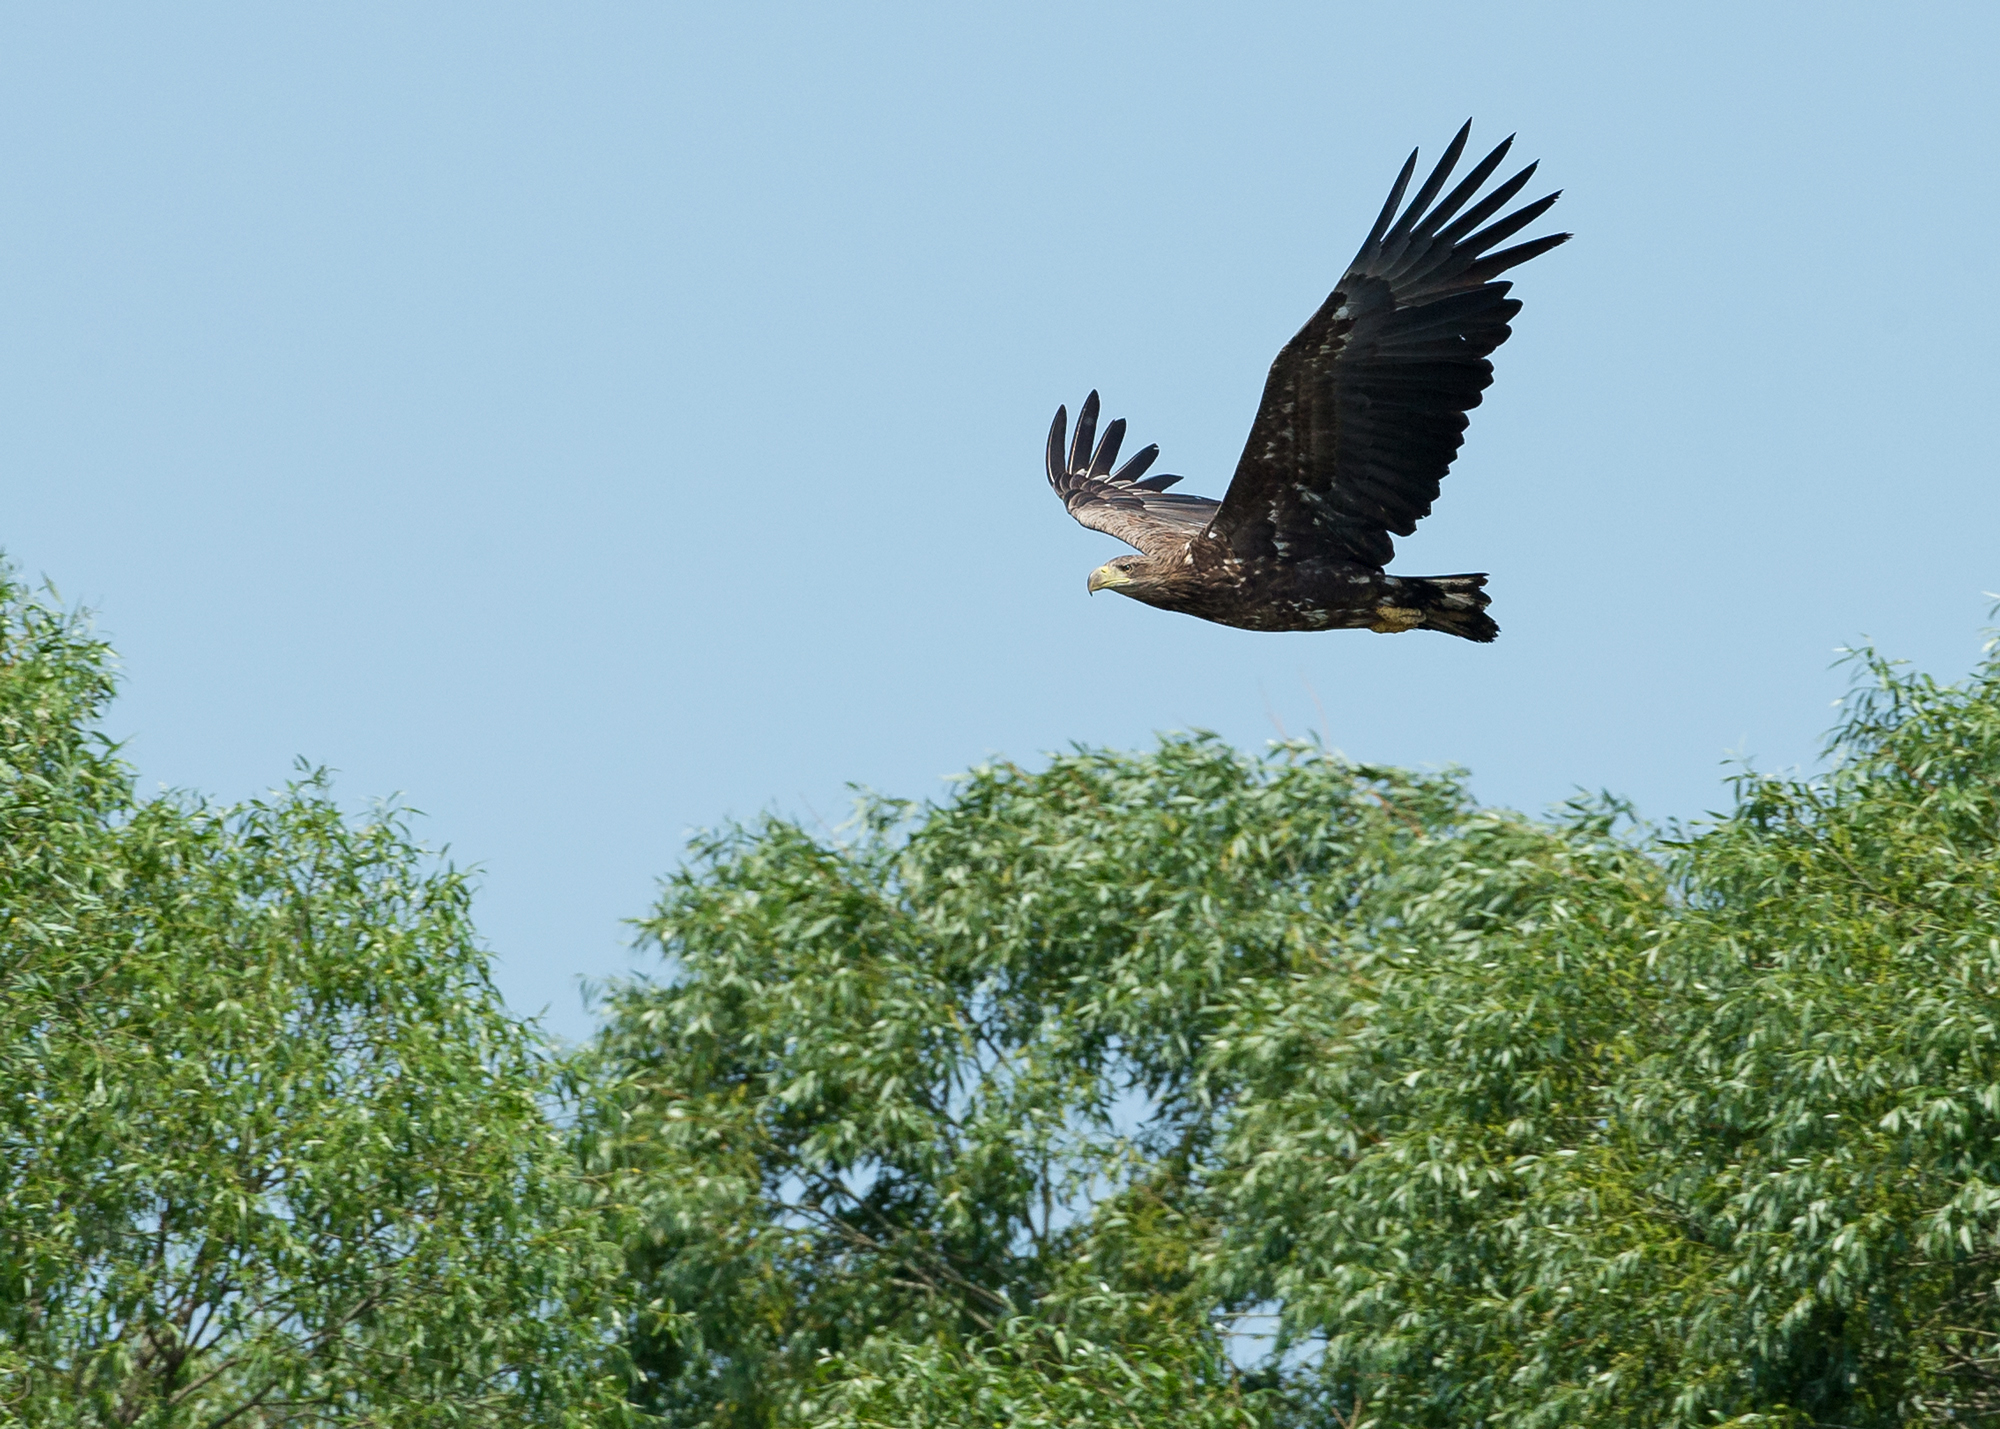 White-tailed Eagle, Pripyat River